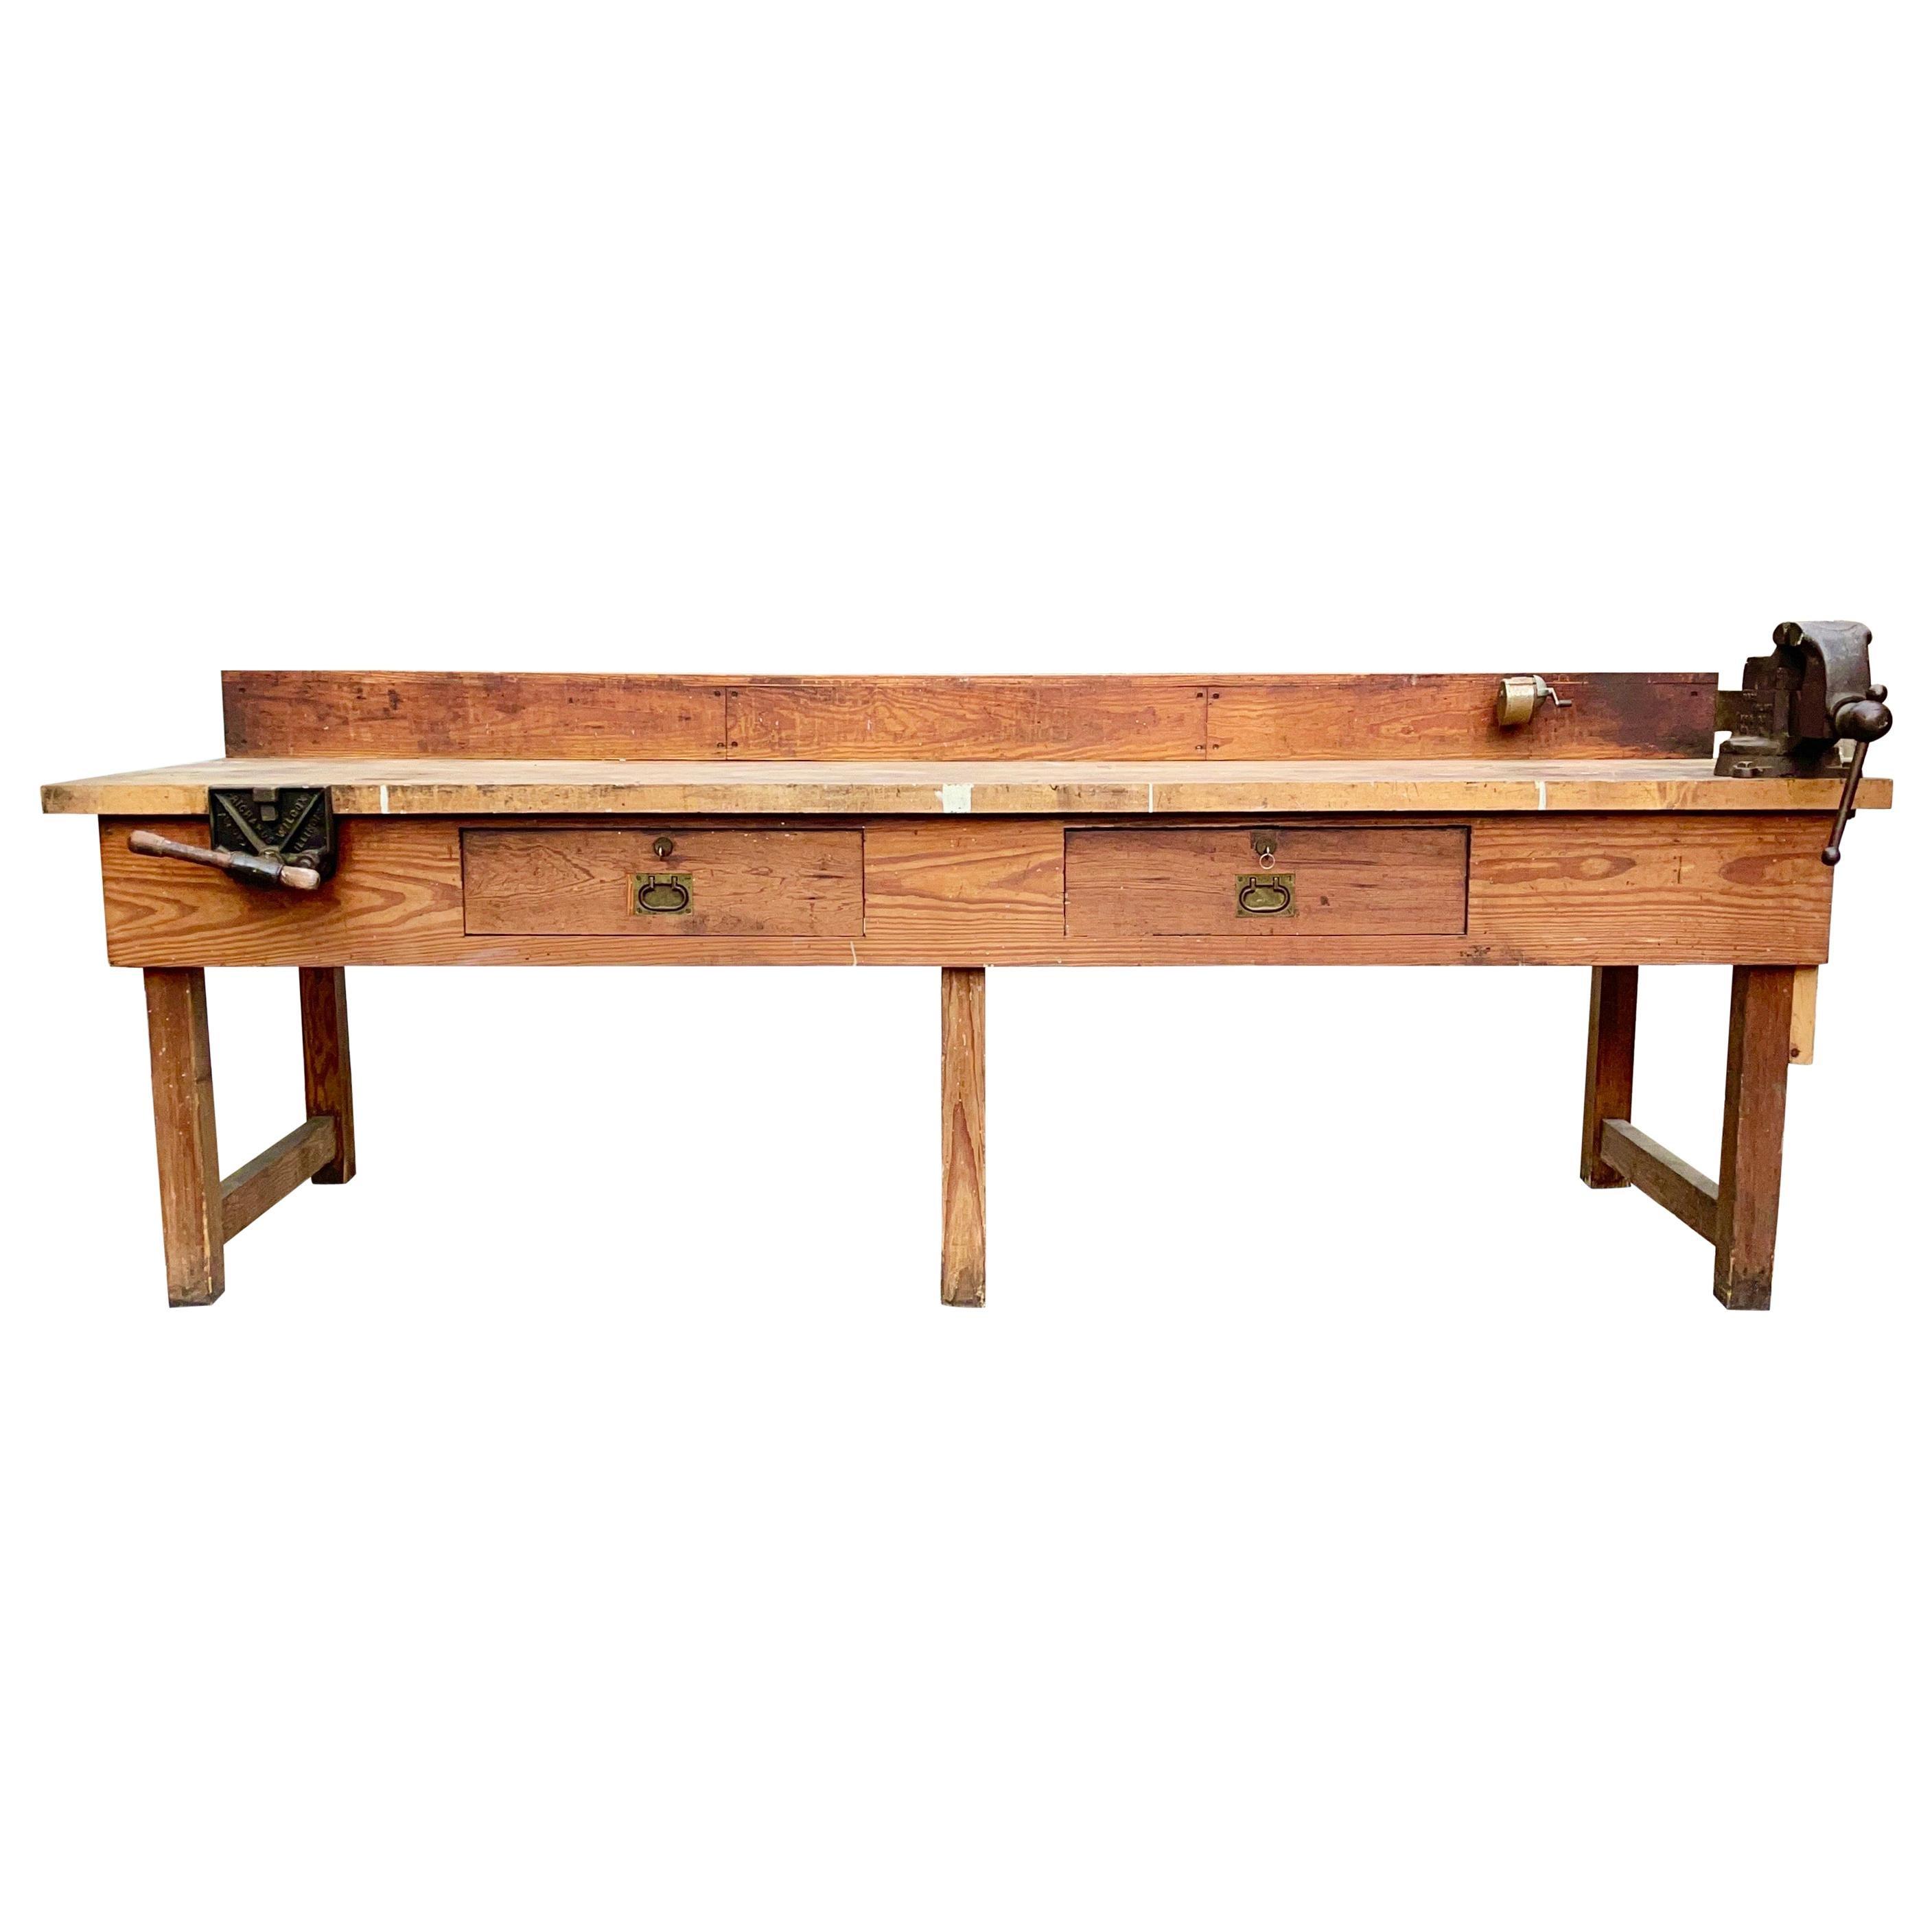 1920s American Built Workshop Table